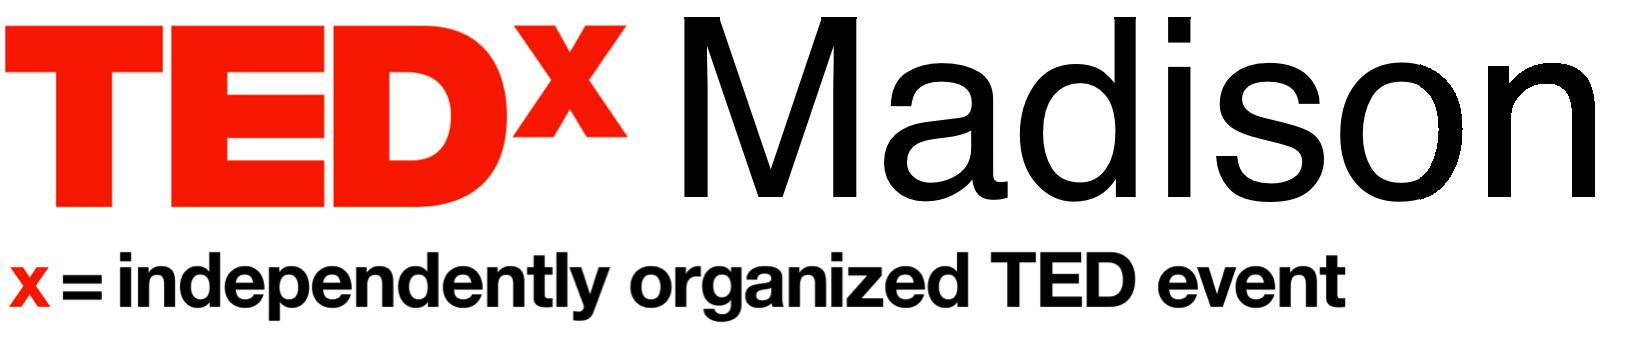 TEDxMadison